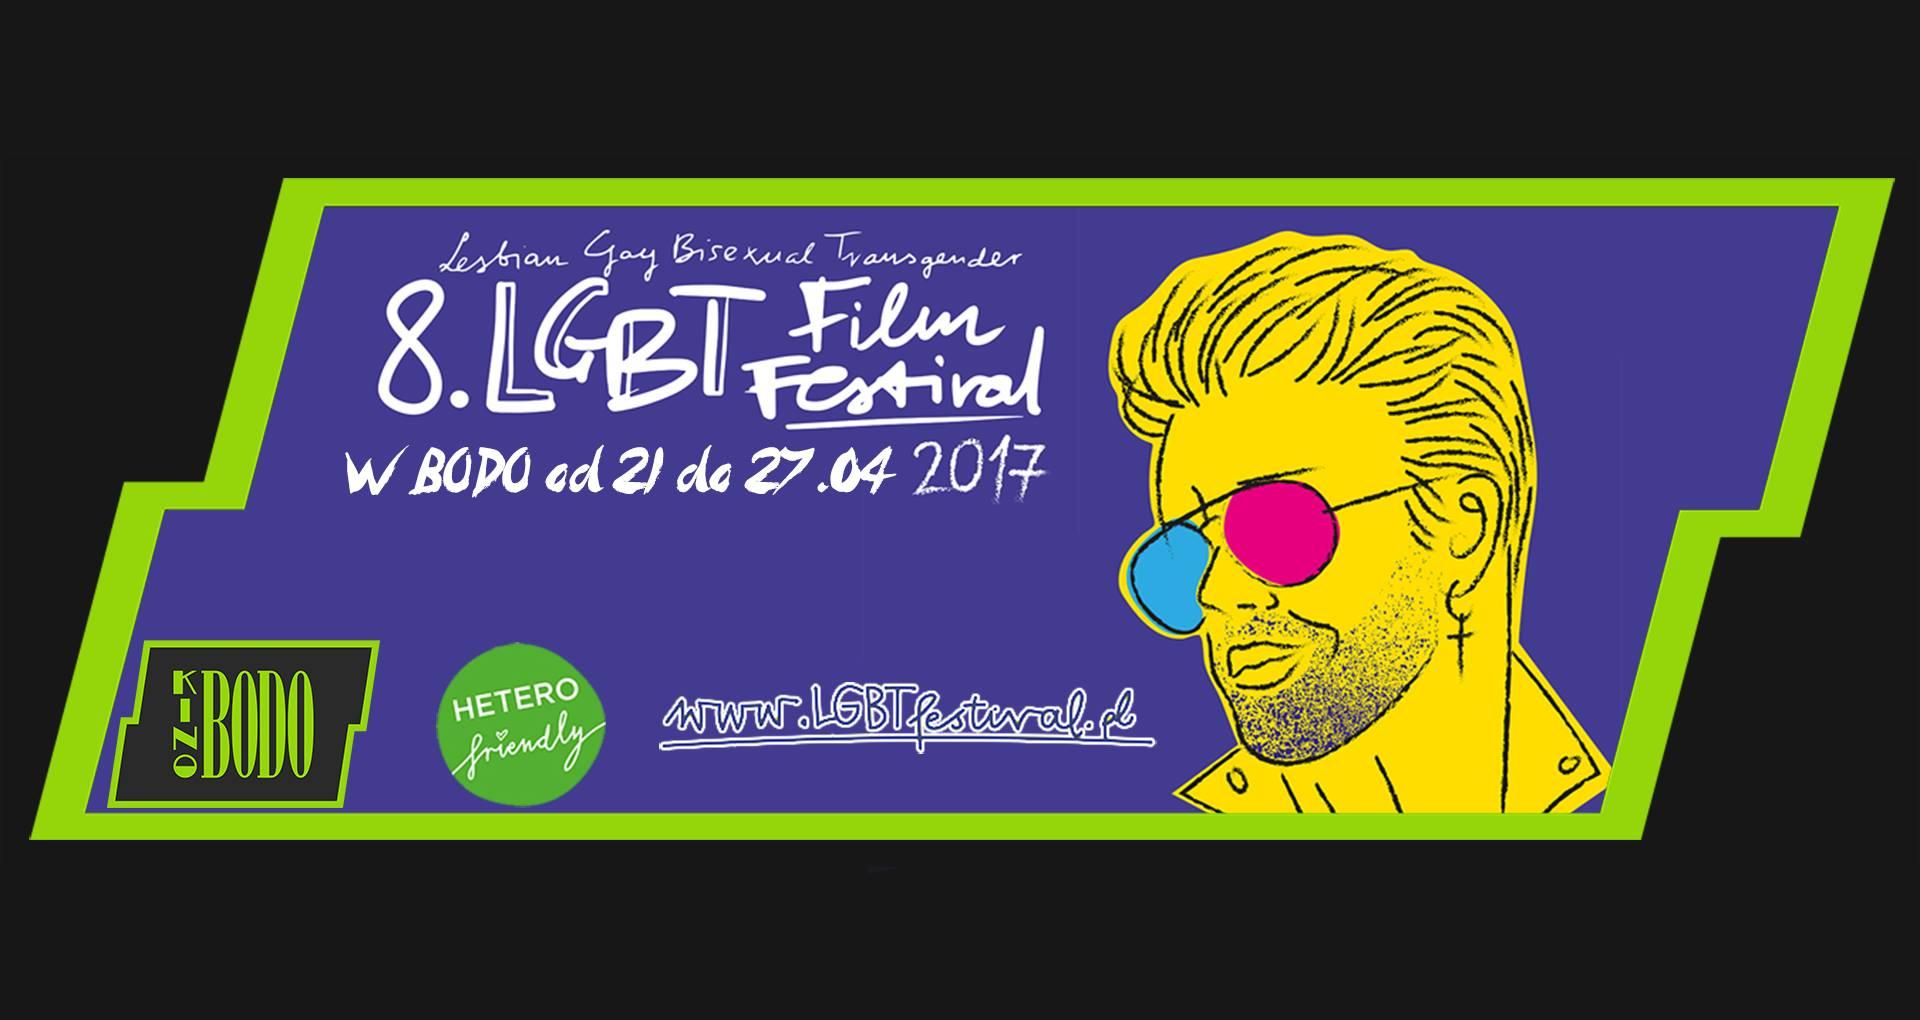 lgbtfilmfestiwal